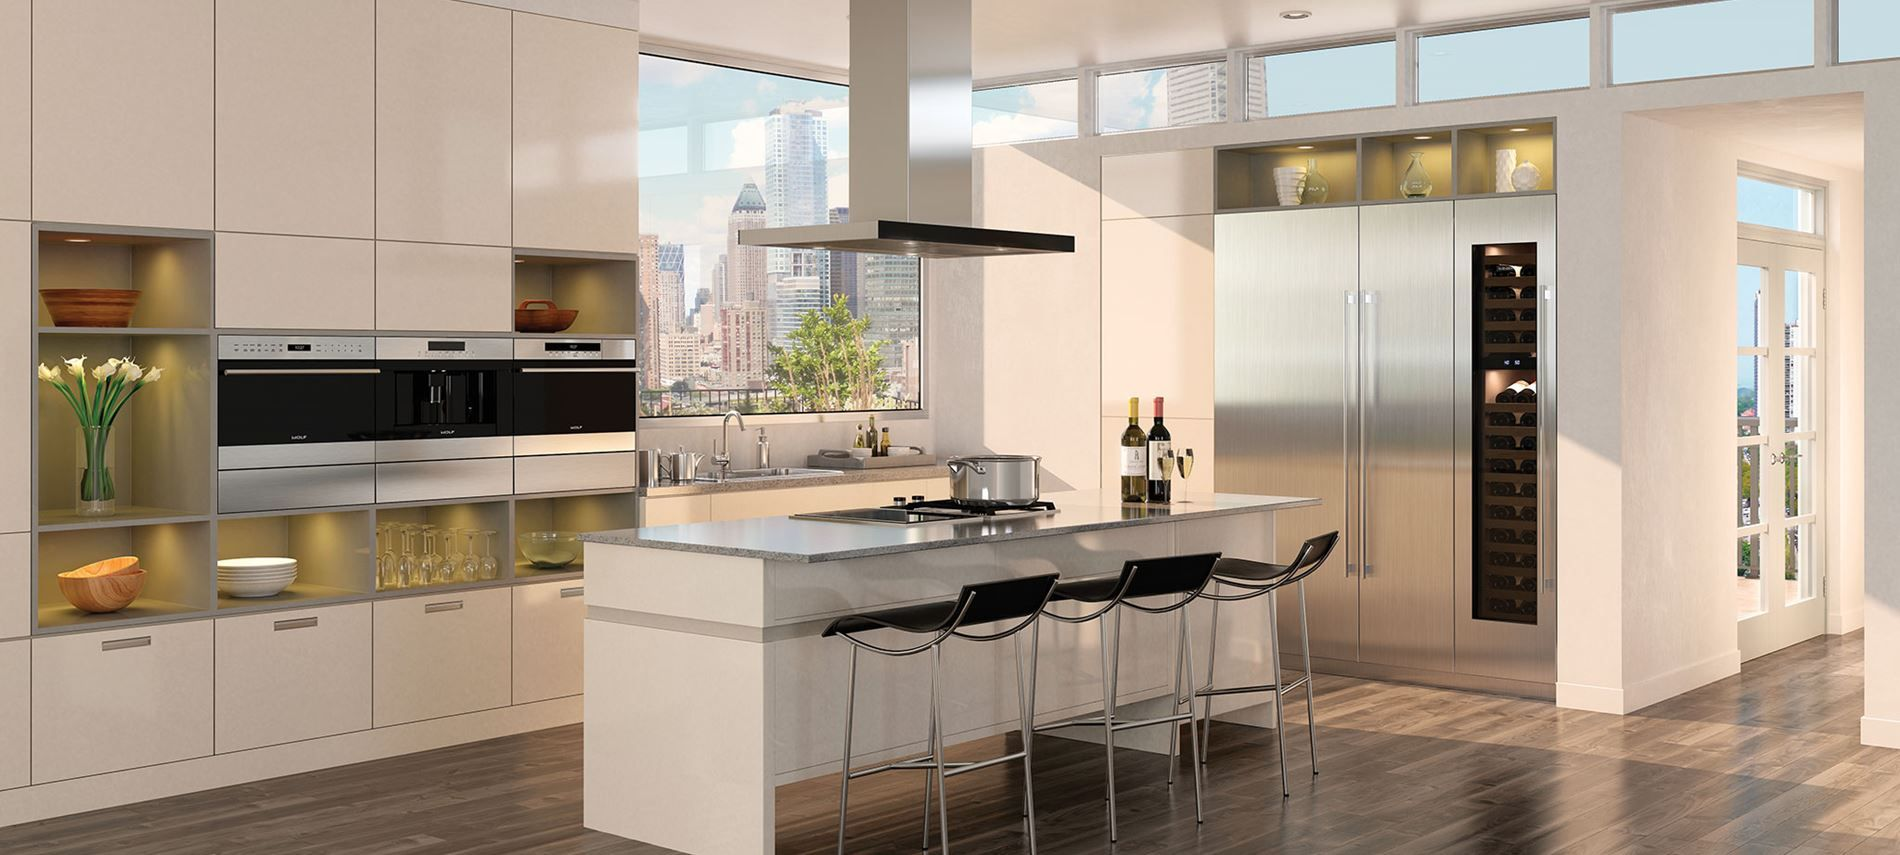 like the faucet siematic kitchen improvements pinterest kitchen colors tap and kitchens - Kuchenfarben 2015